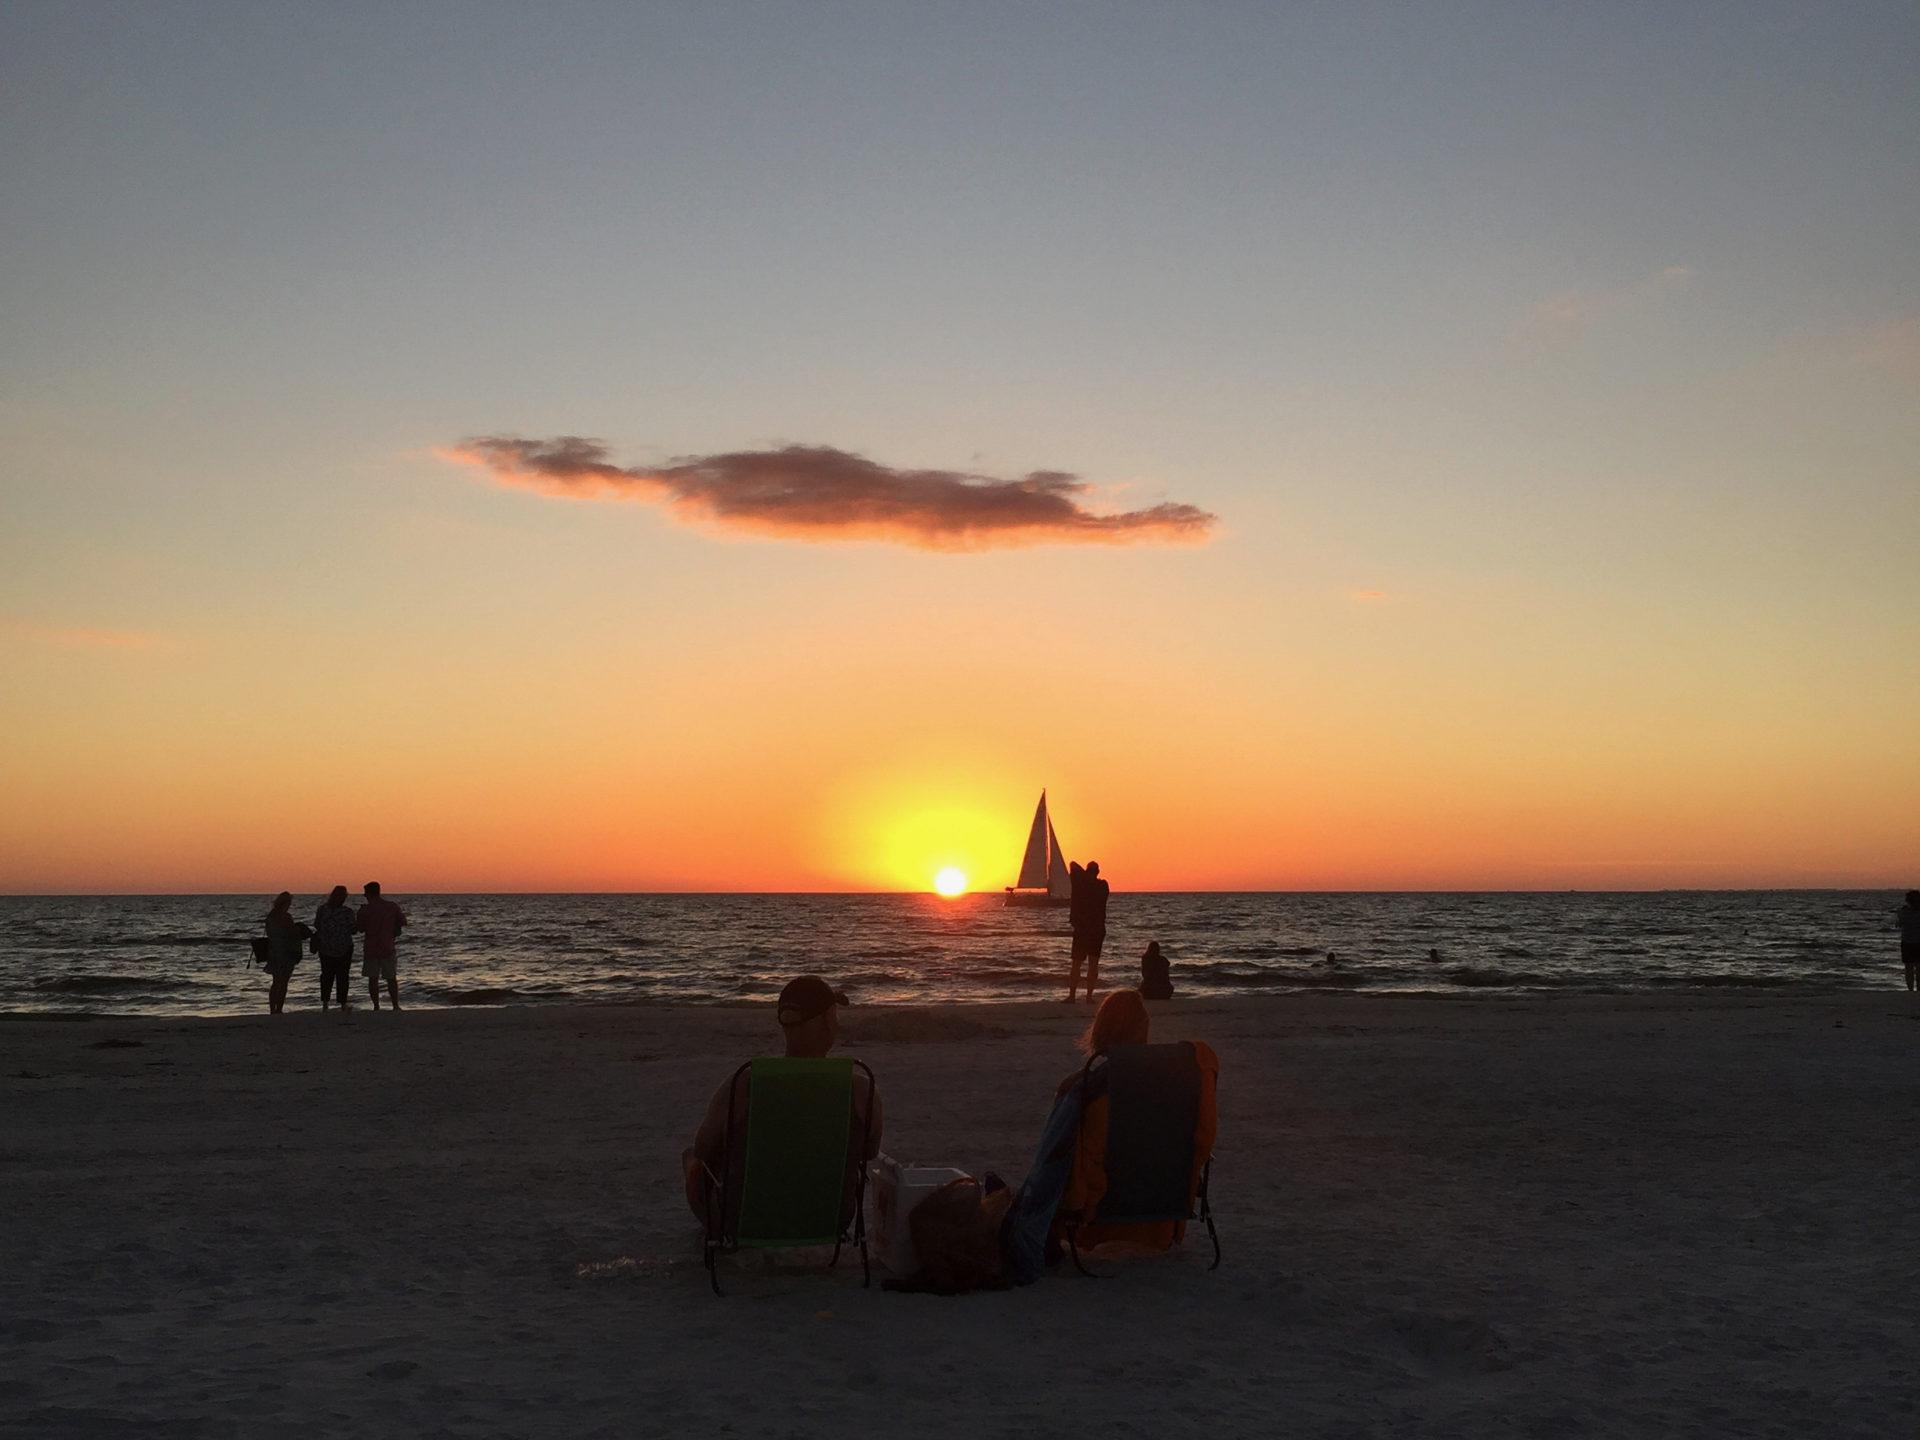 Sonenunterang auf Sanibel Island in Florida mit Segelboot